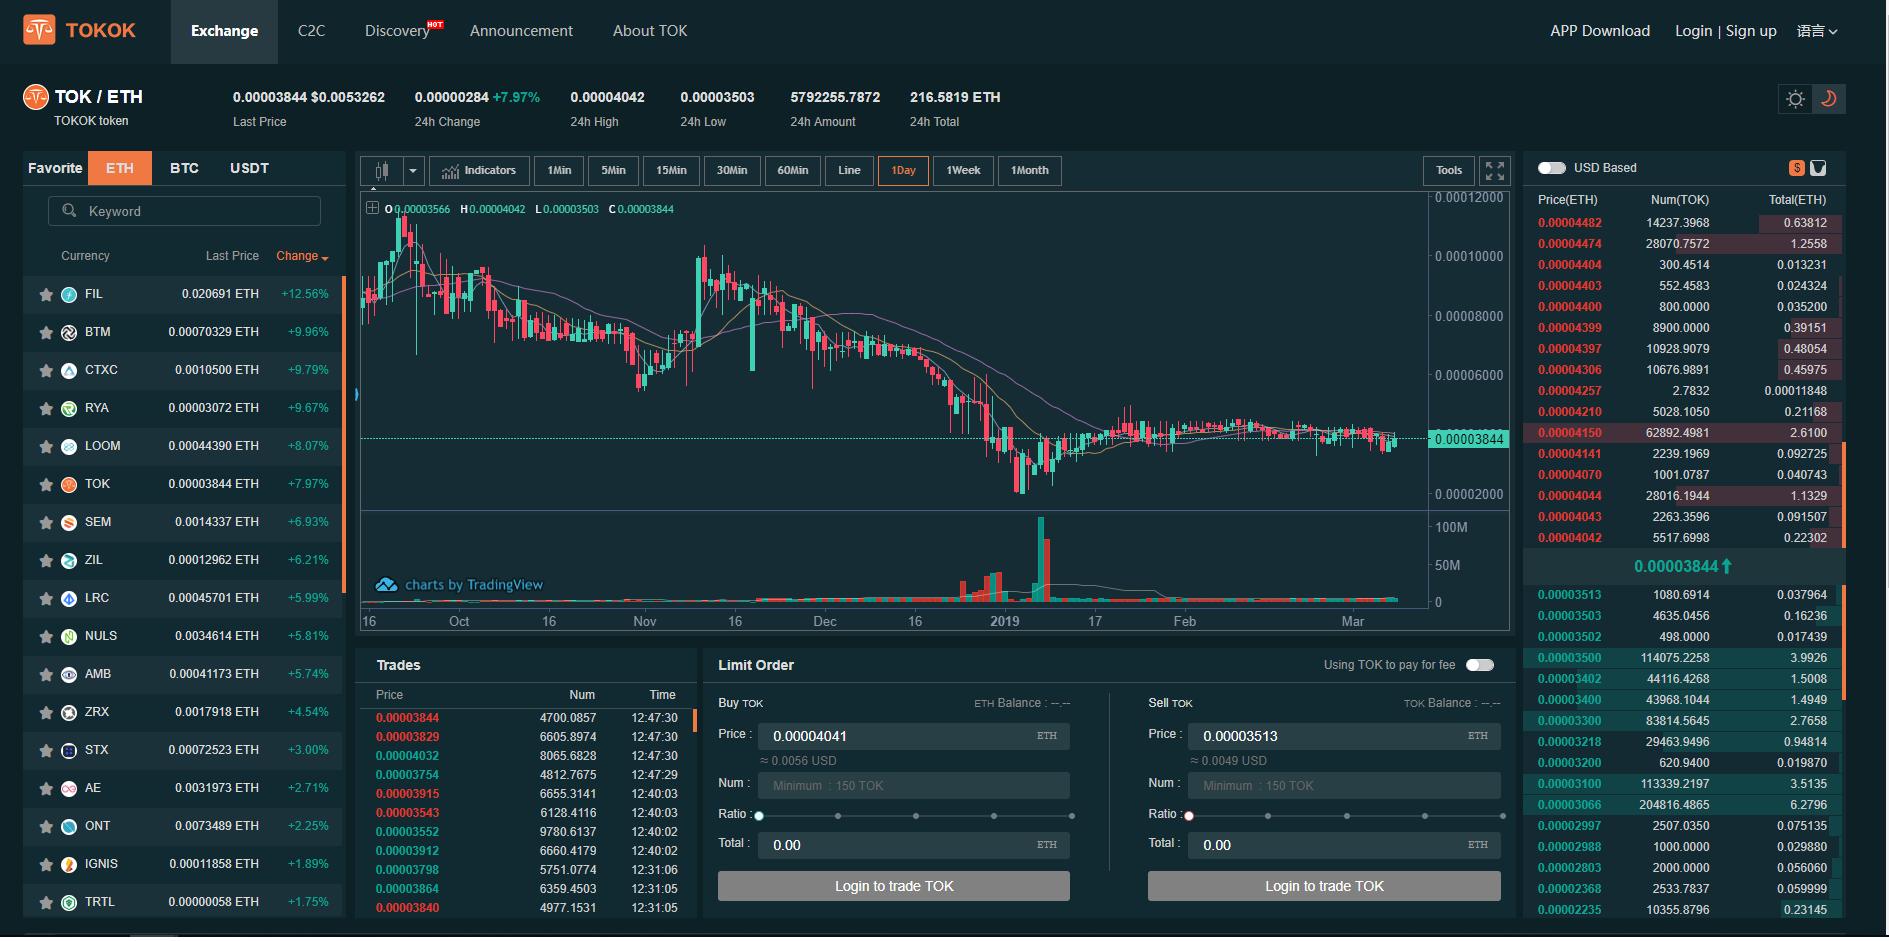 TOKOK-Trading-View